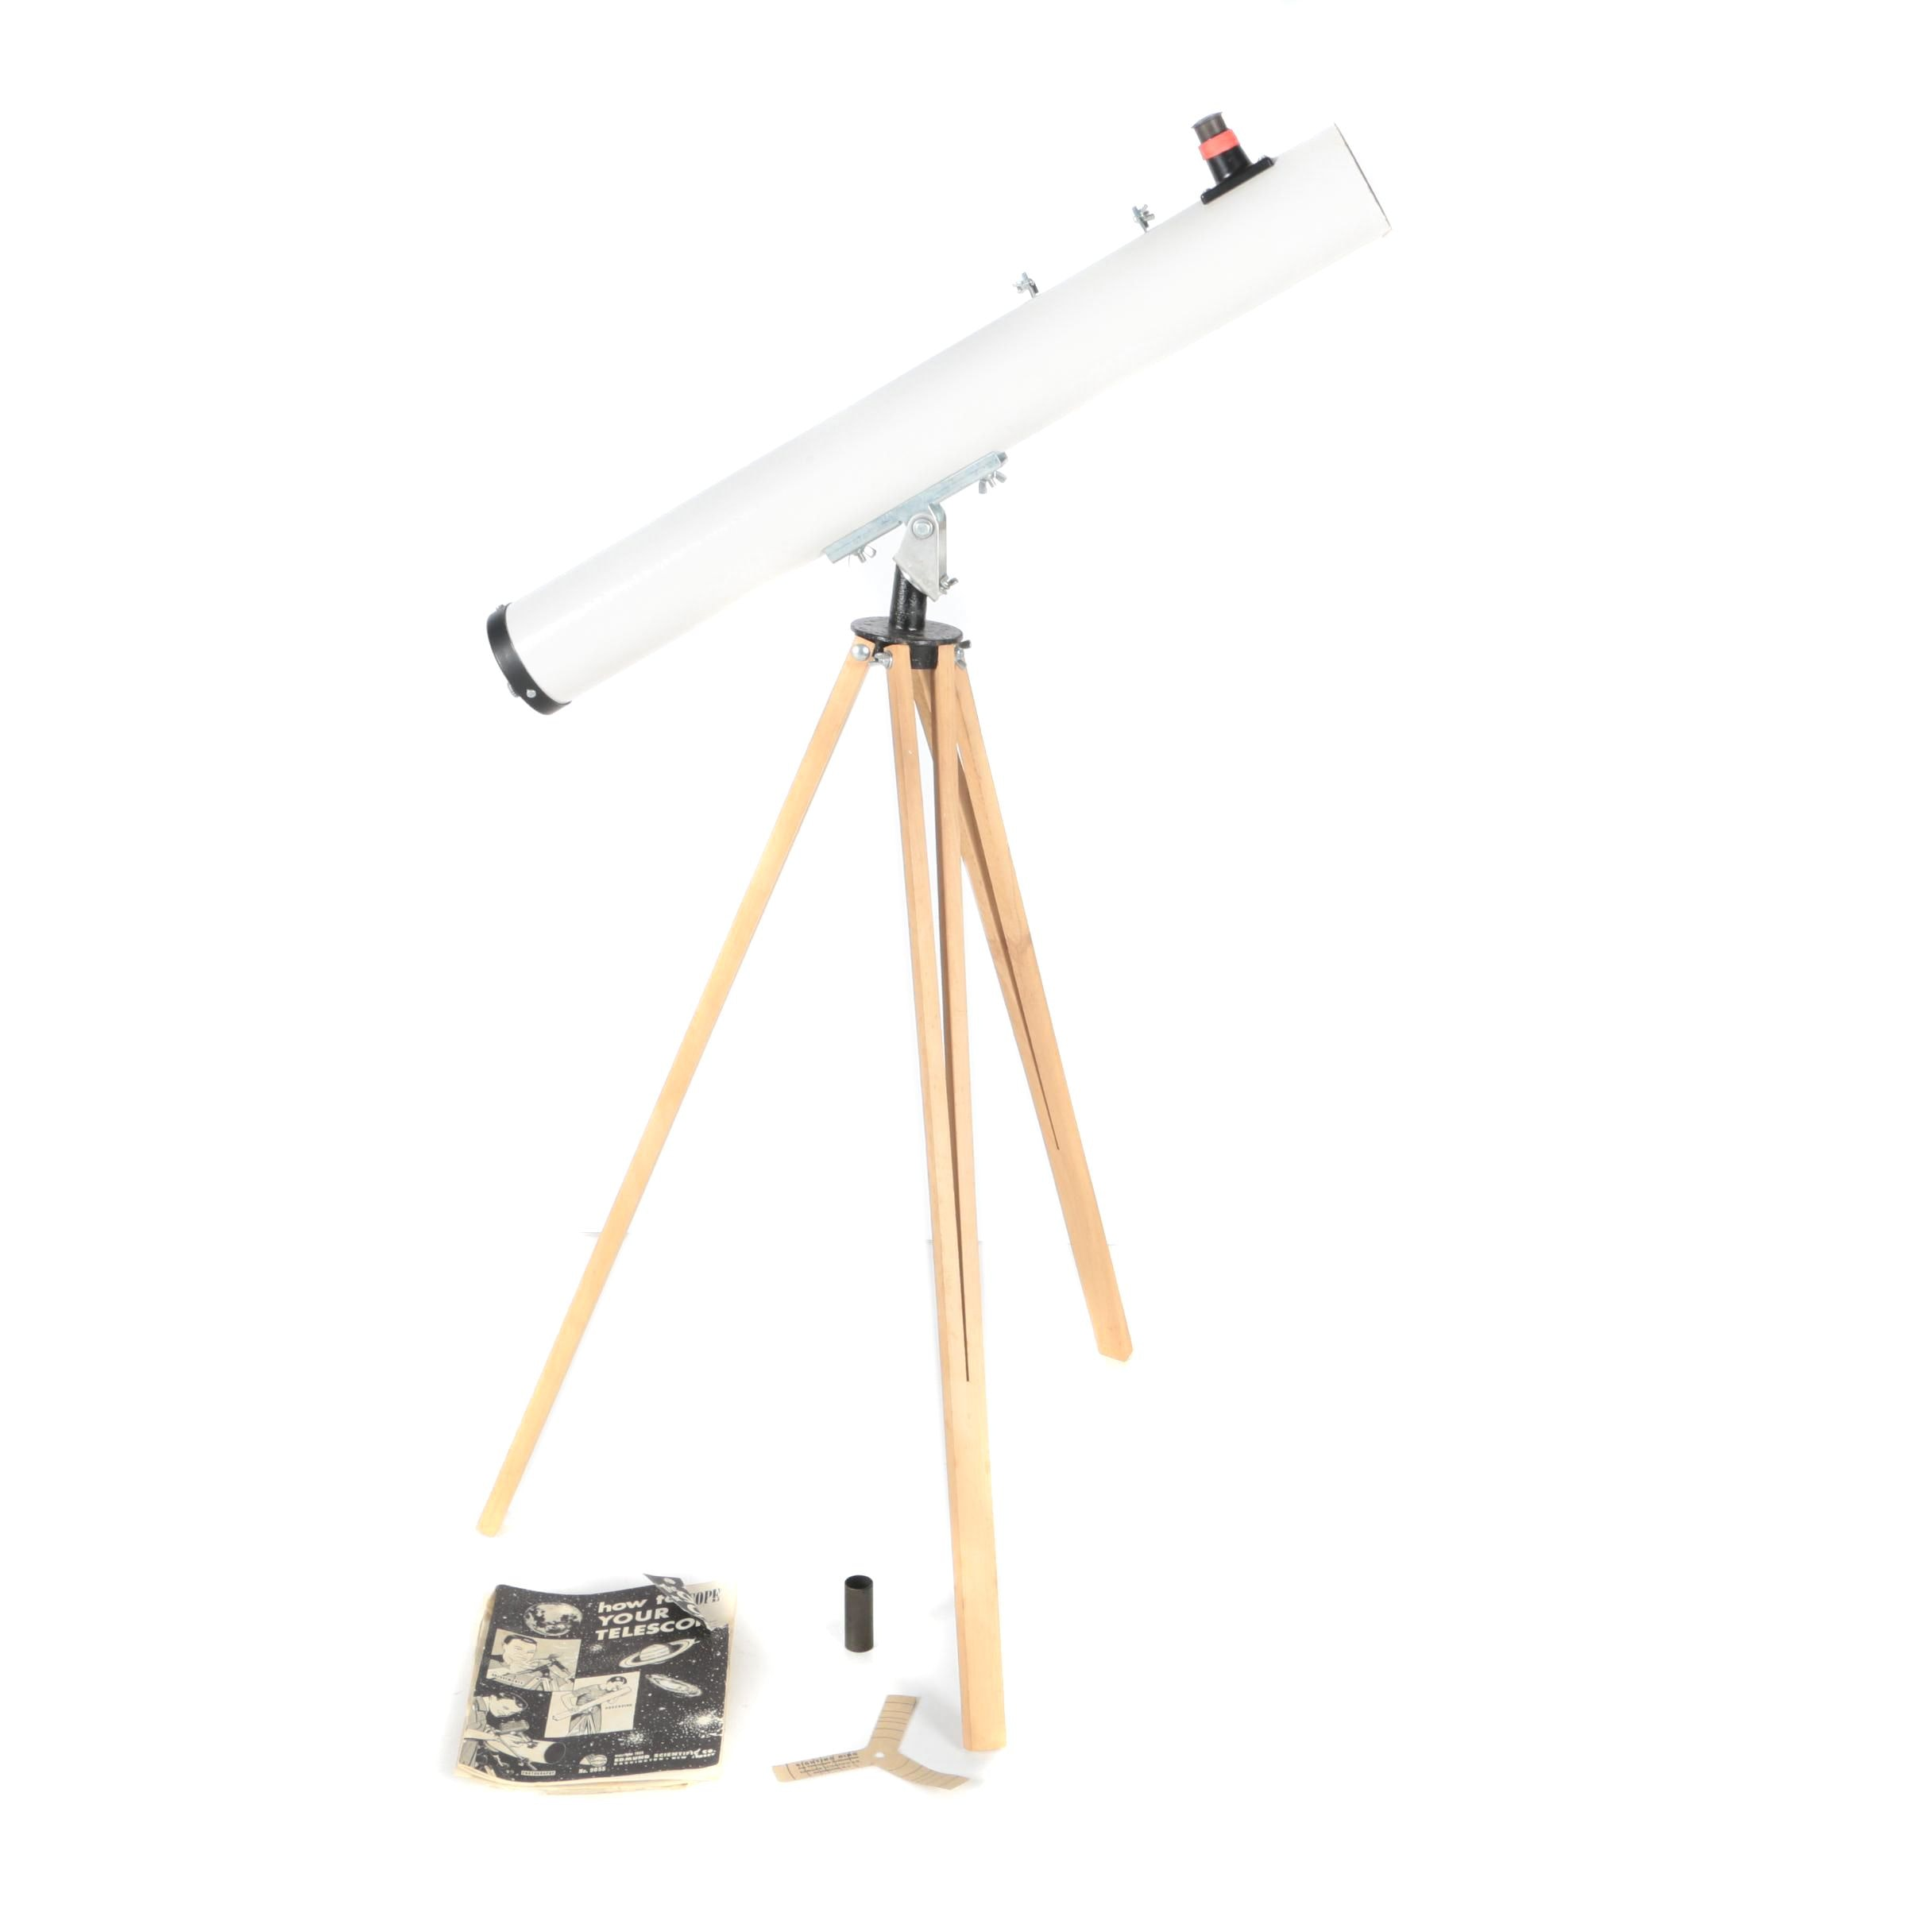 Vintage Edmund Scientific Company Reflector Telescope With Tripod